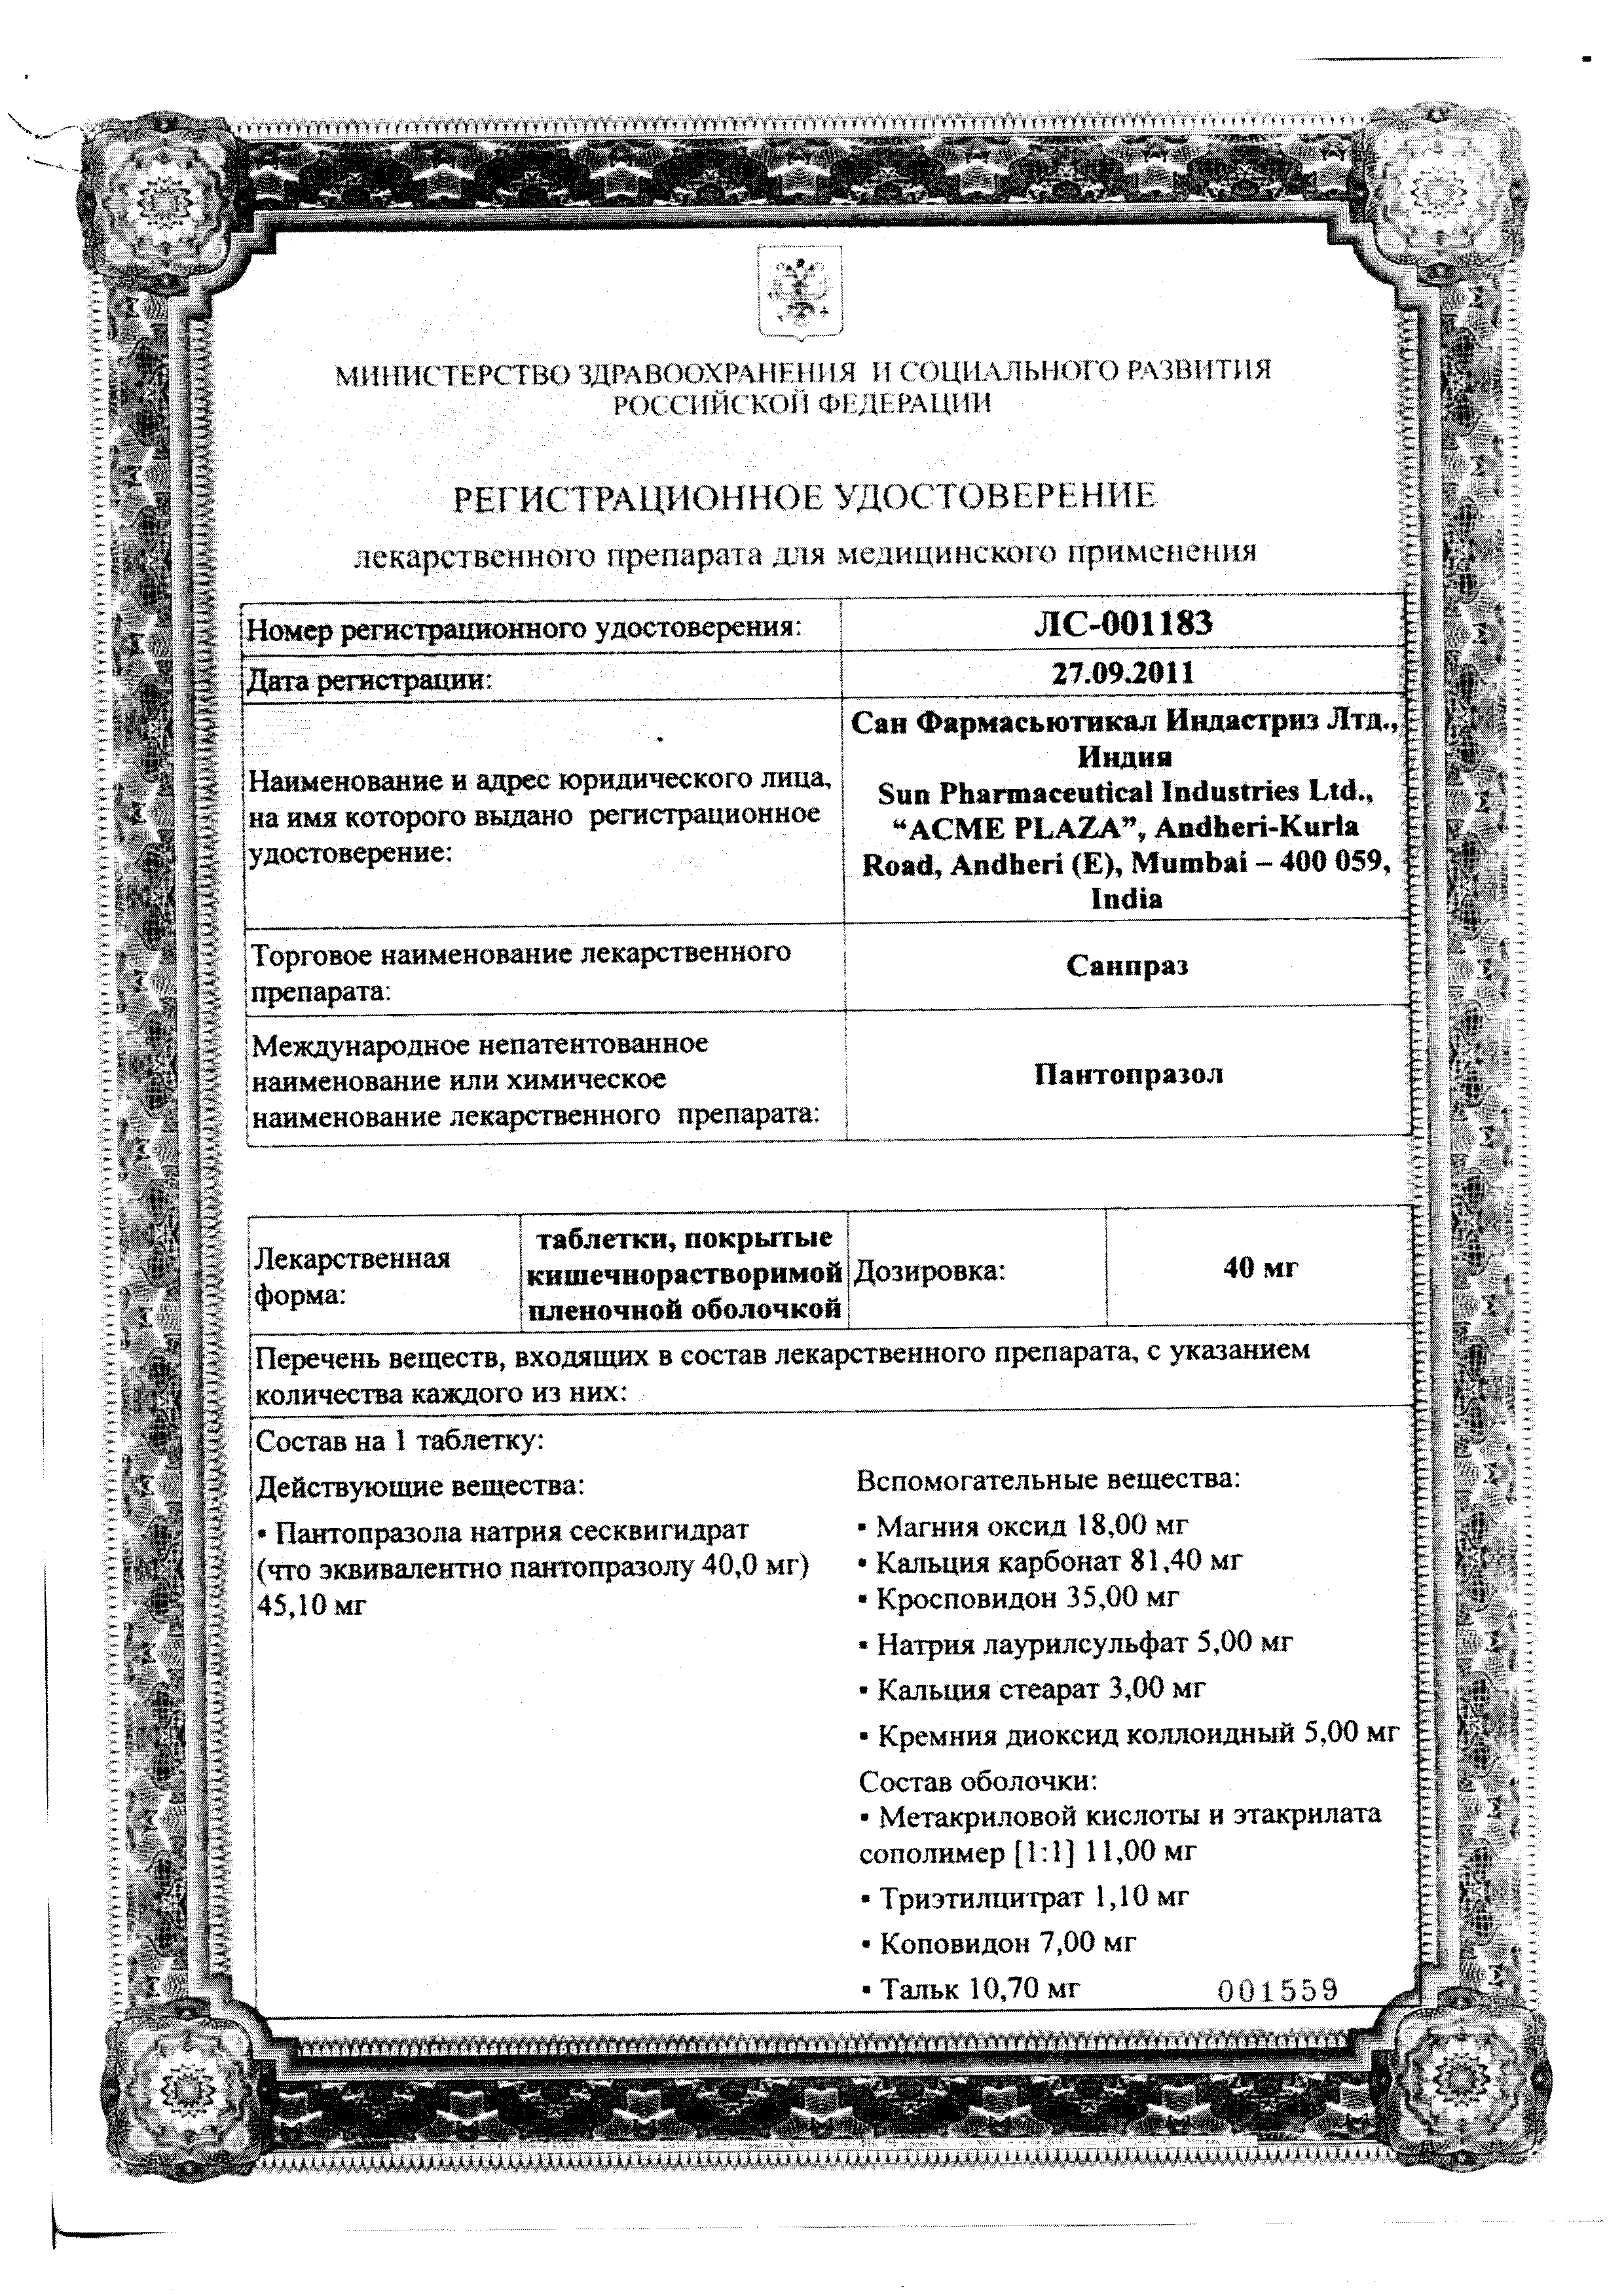 Санпраз сертификат